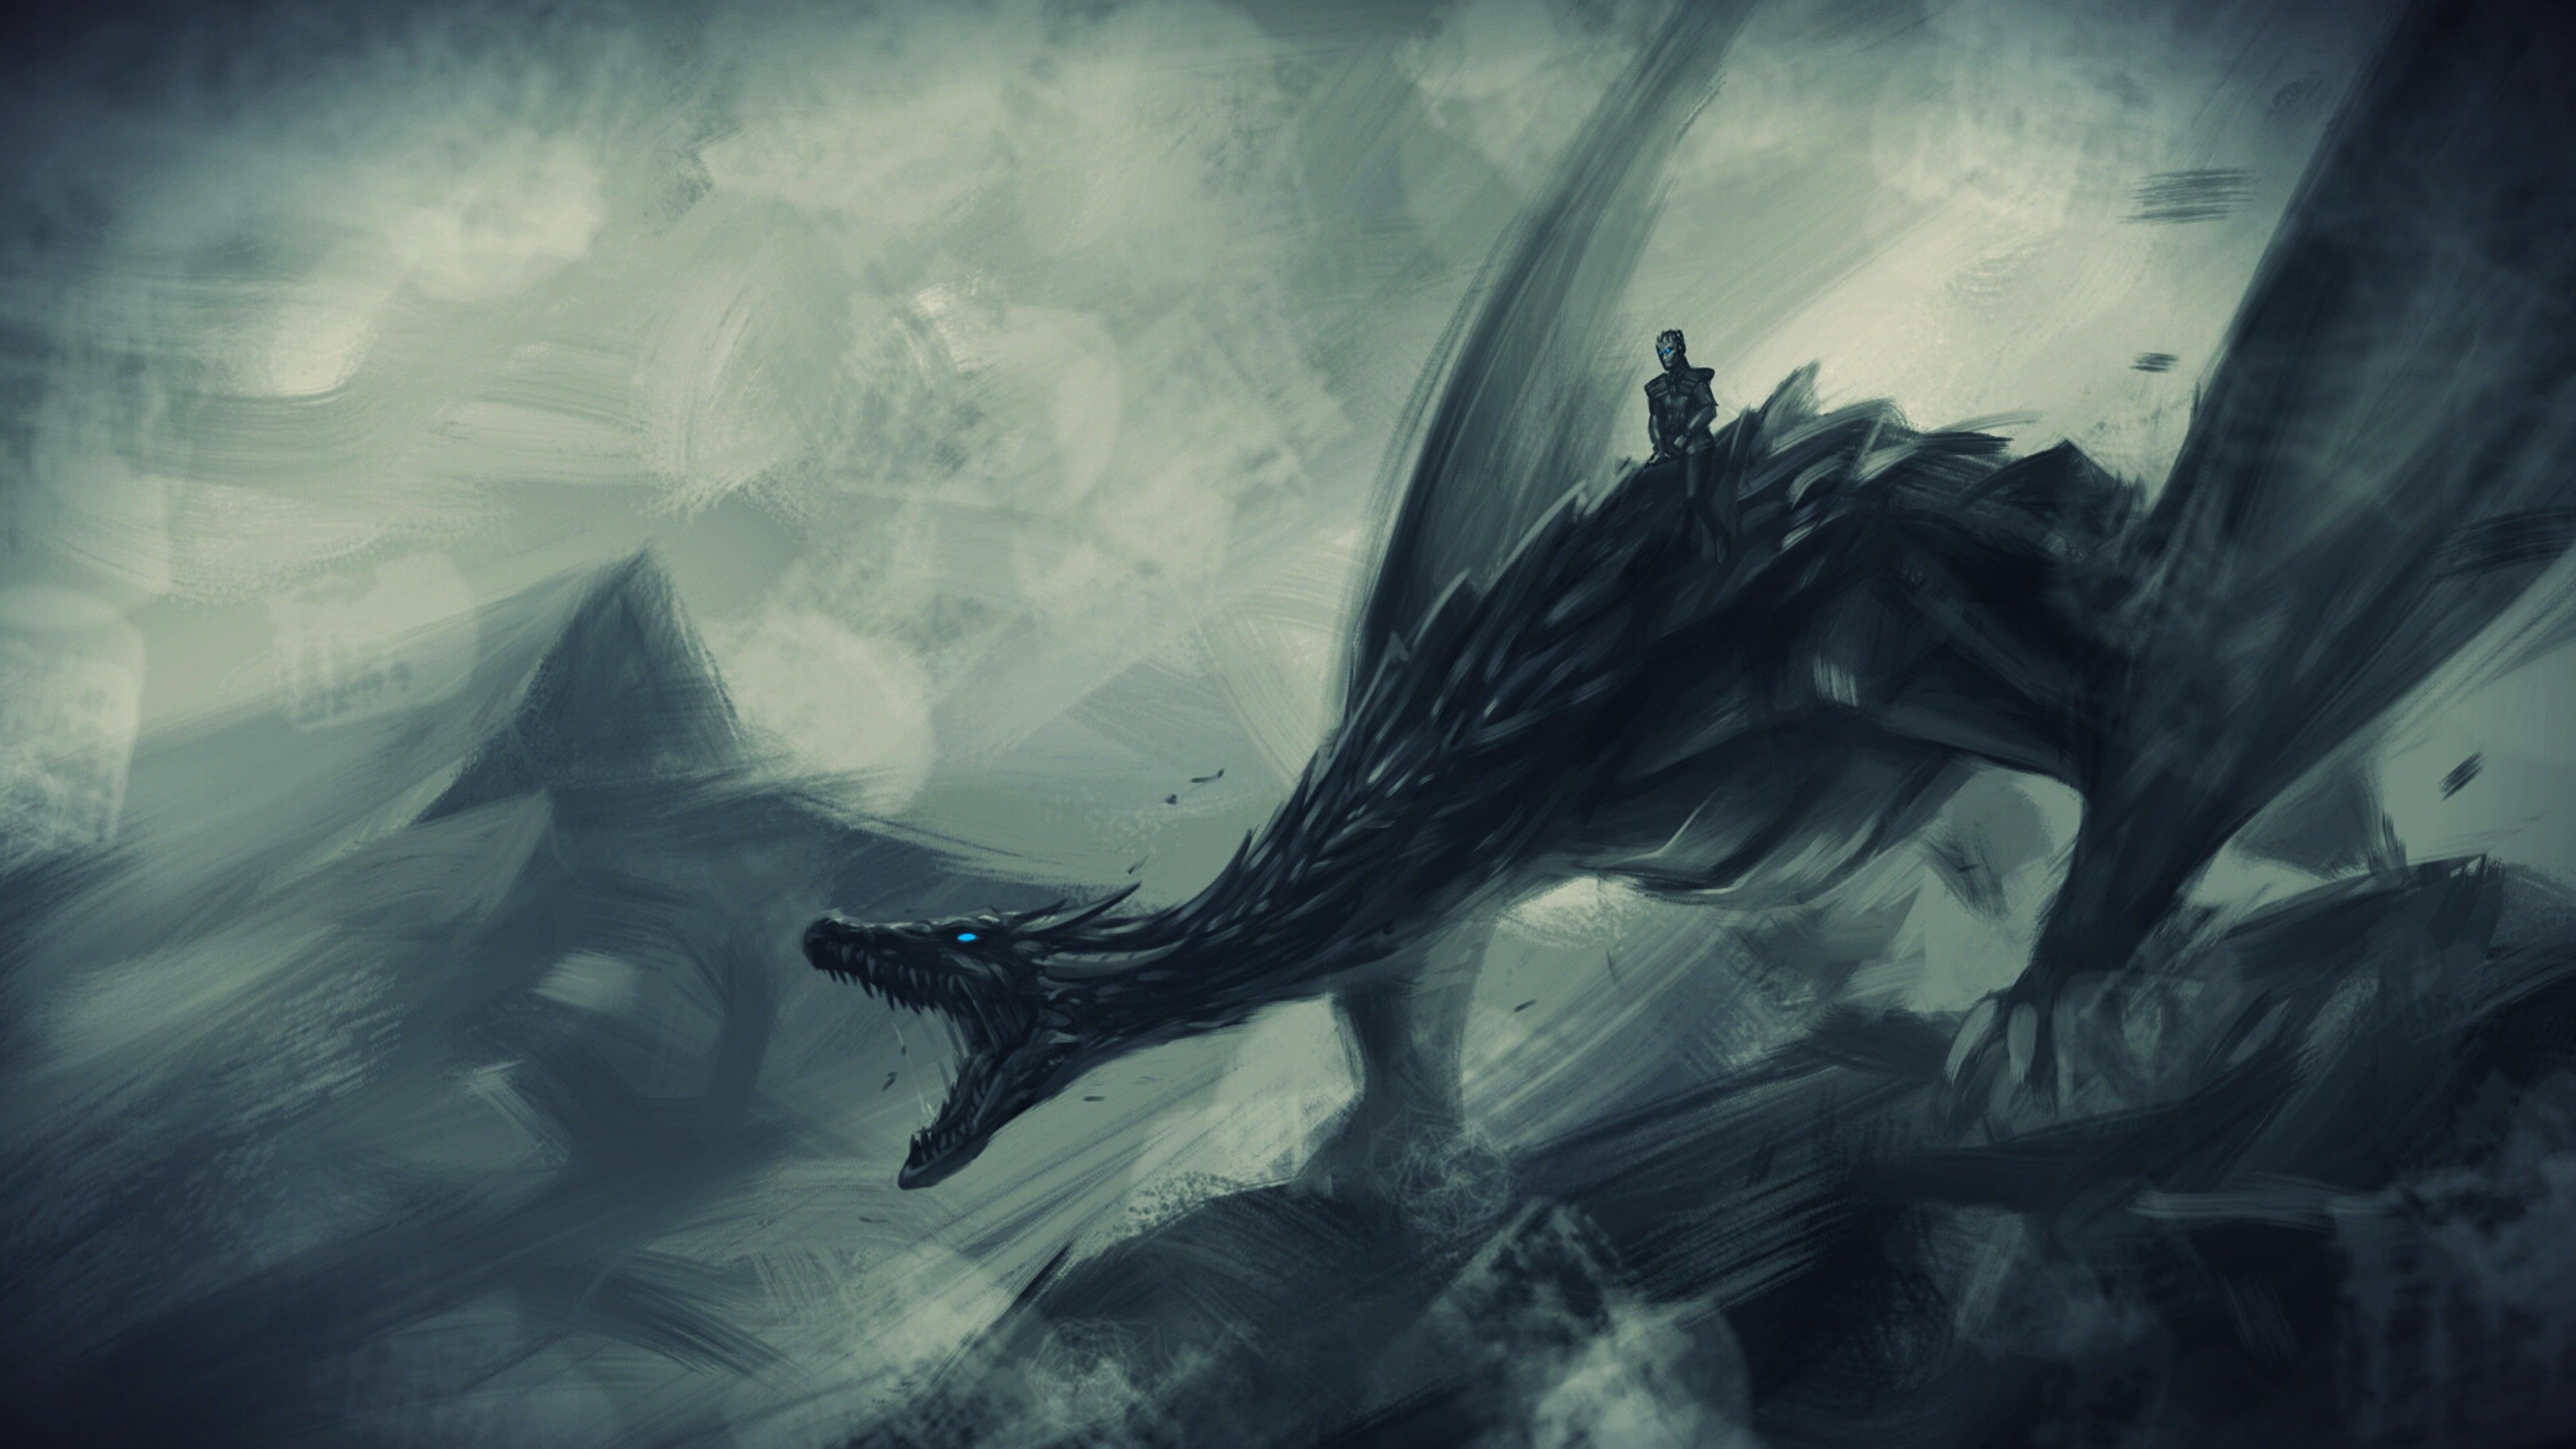 King Dragon Wallpapers Top Free King Dragon Backgrounds